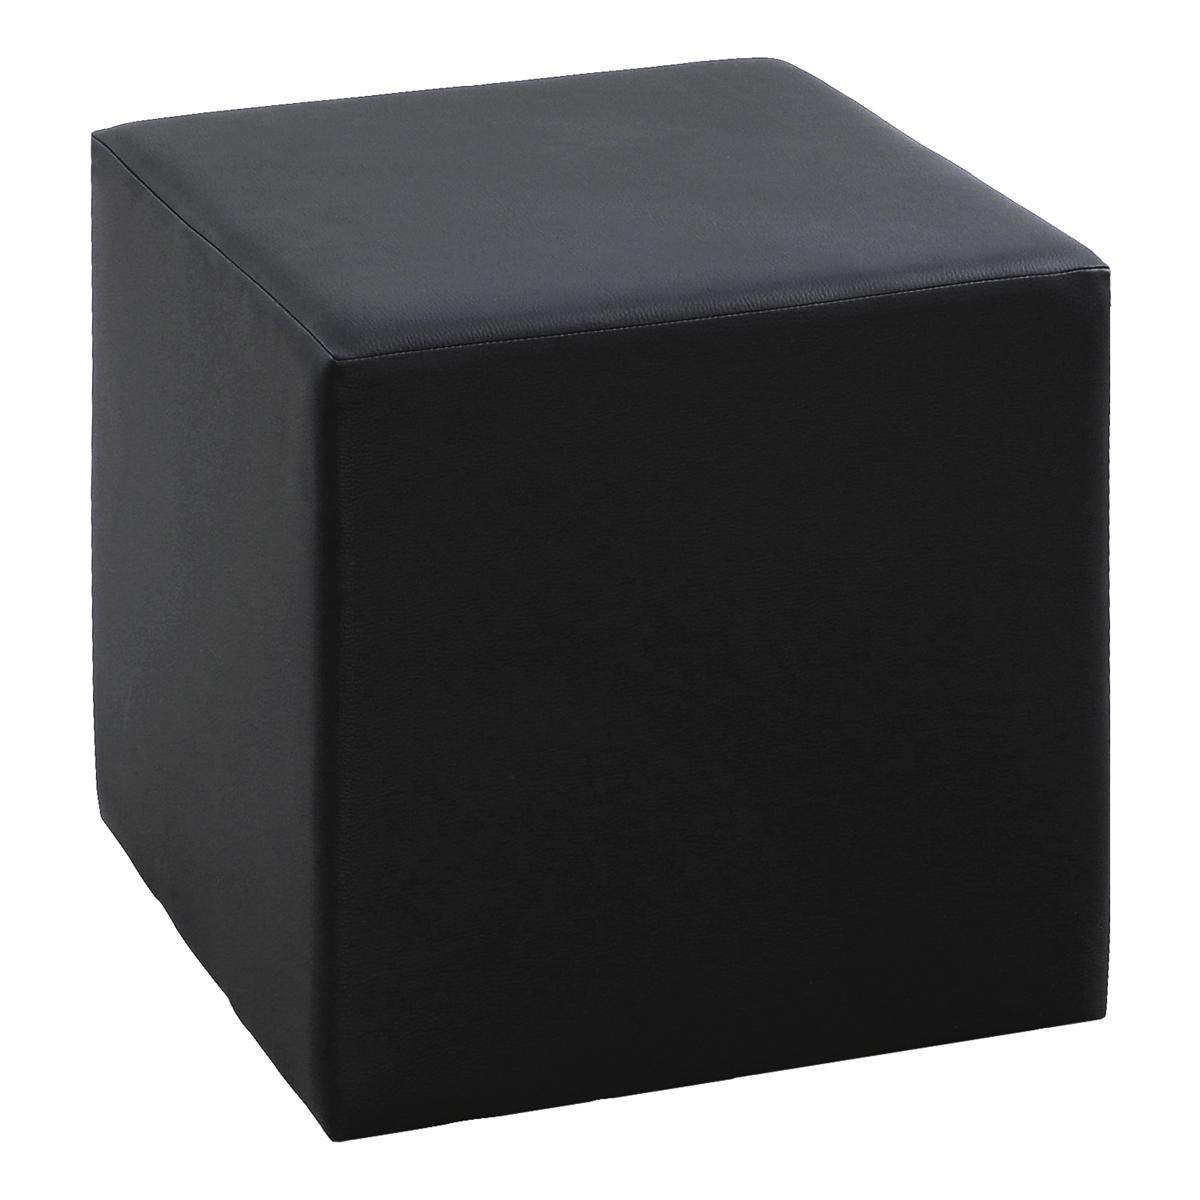 Hocker Cubi, schwarz